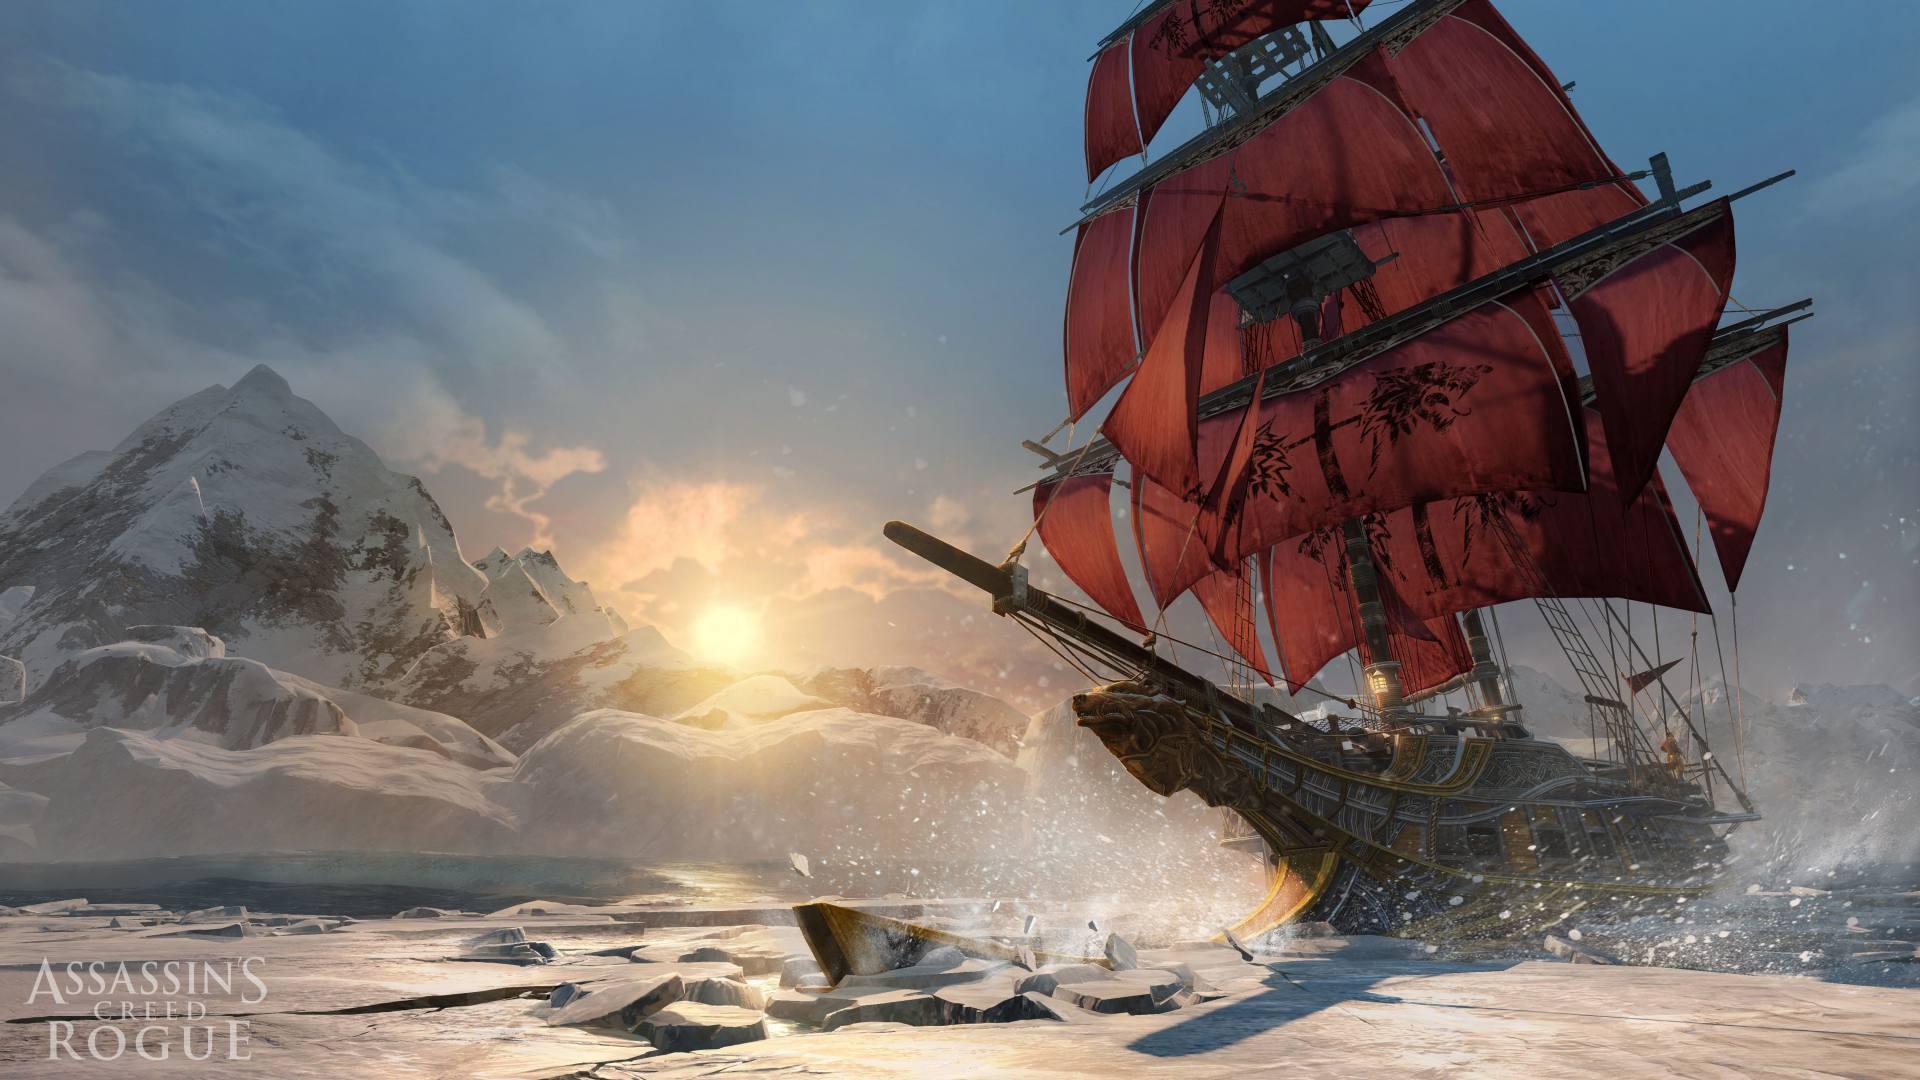 Assassin's Creed Rogue 05-08-14 006